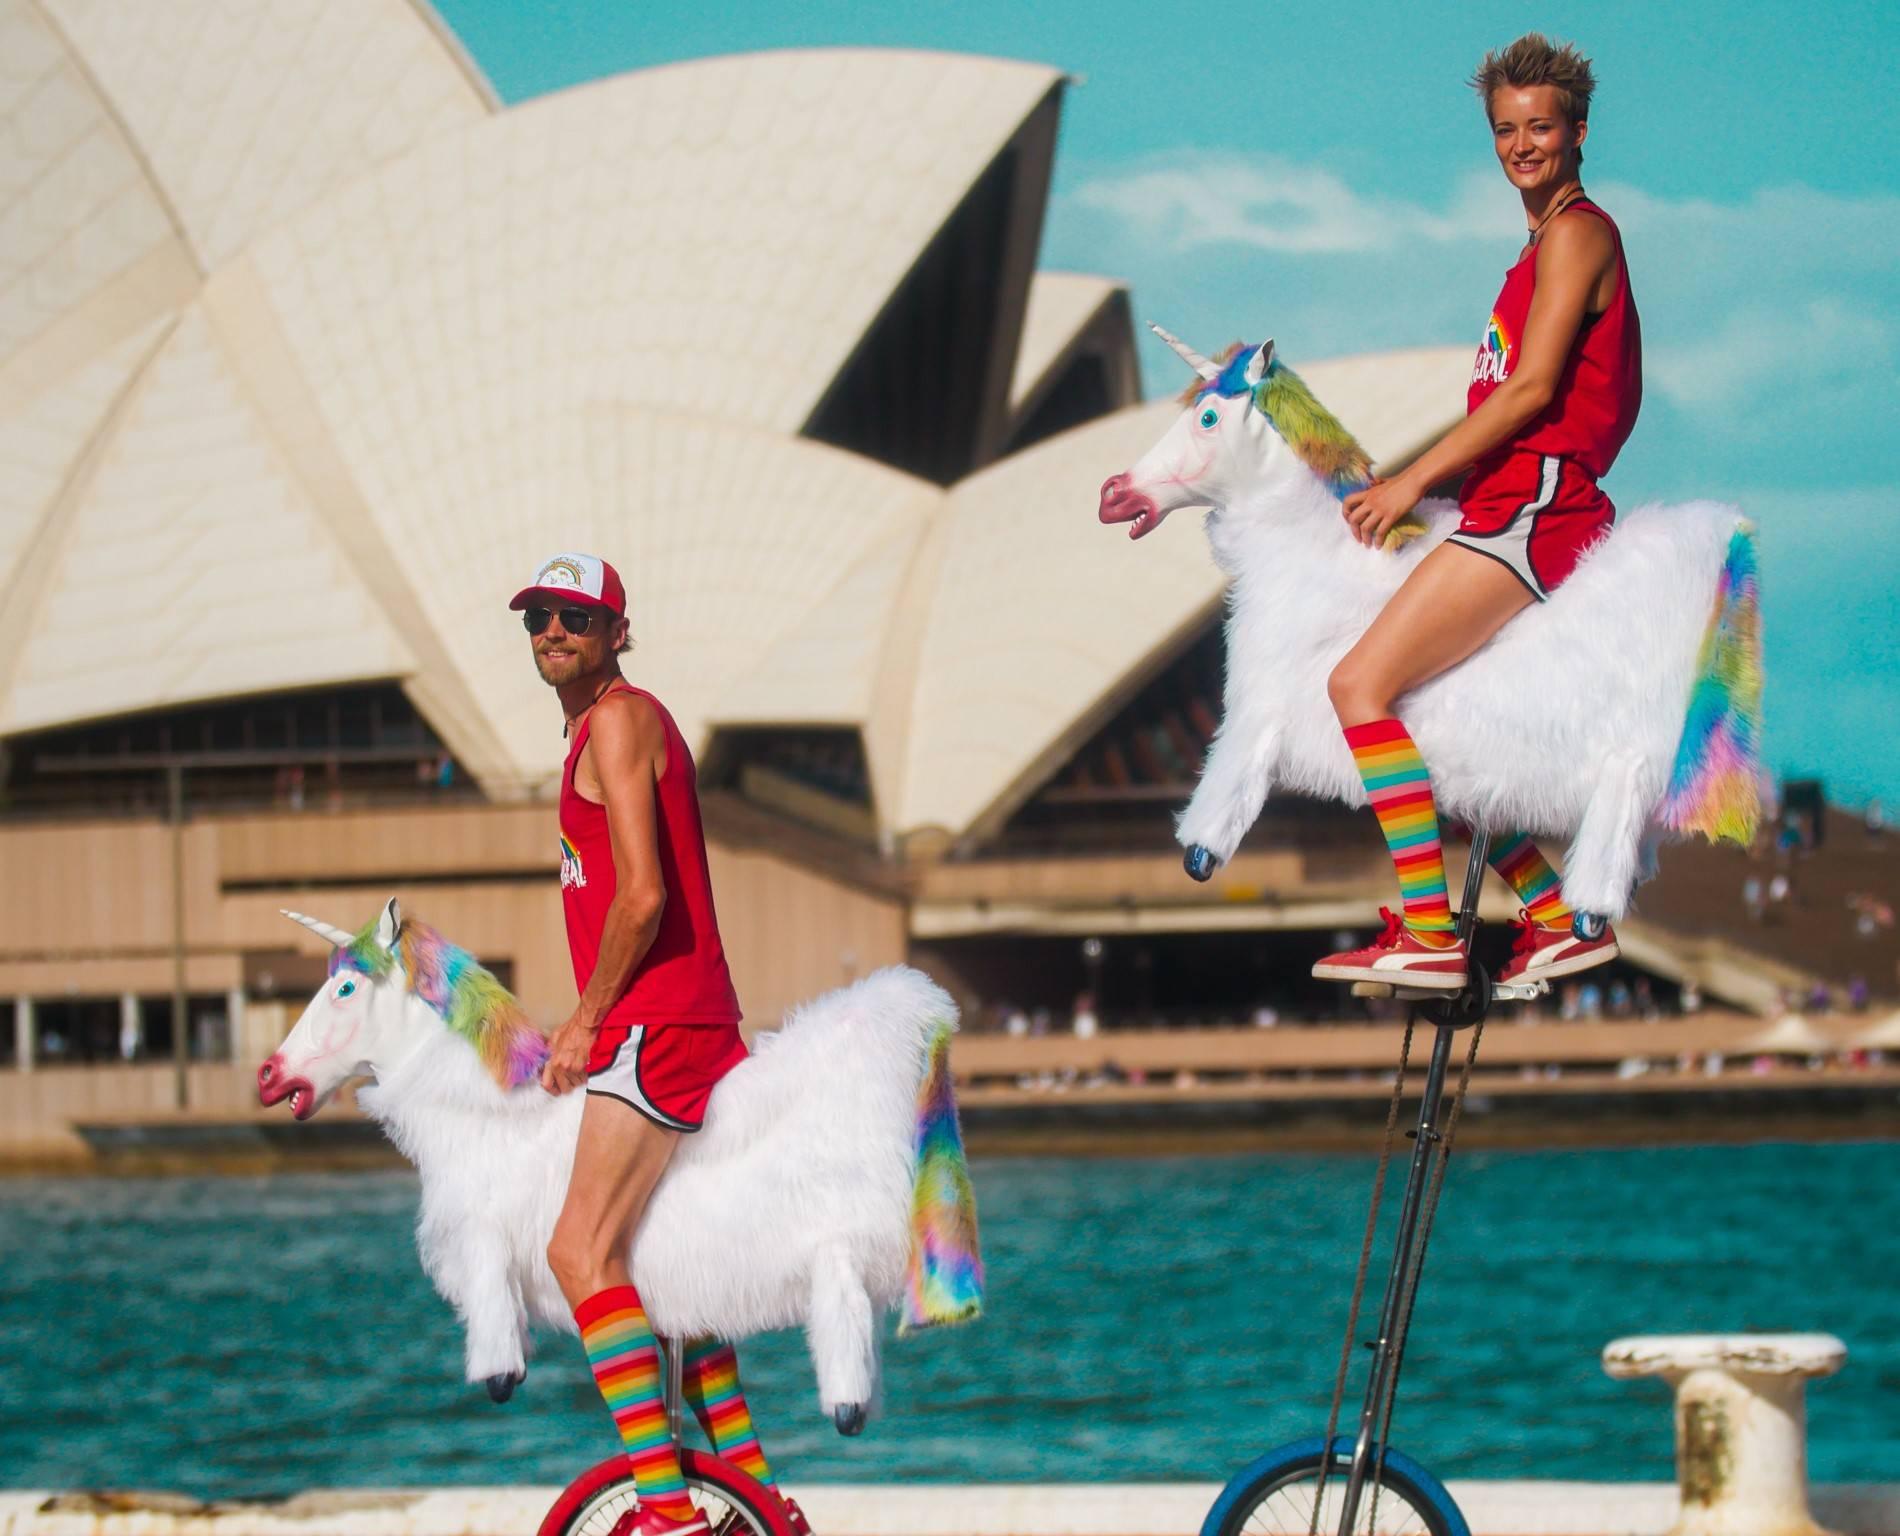 Just cruising around the Sydney Opera House!